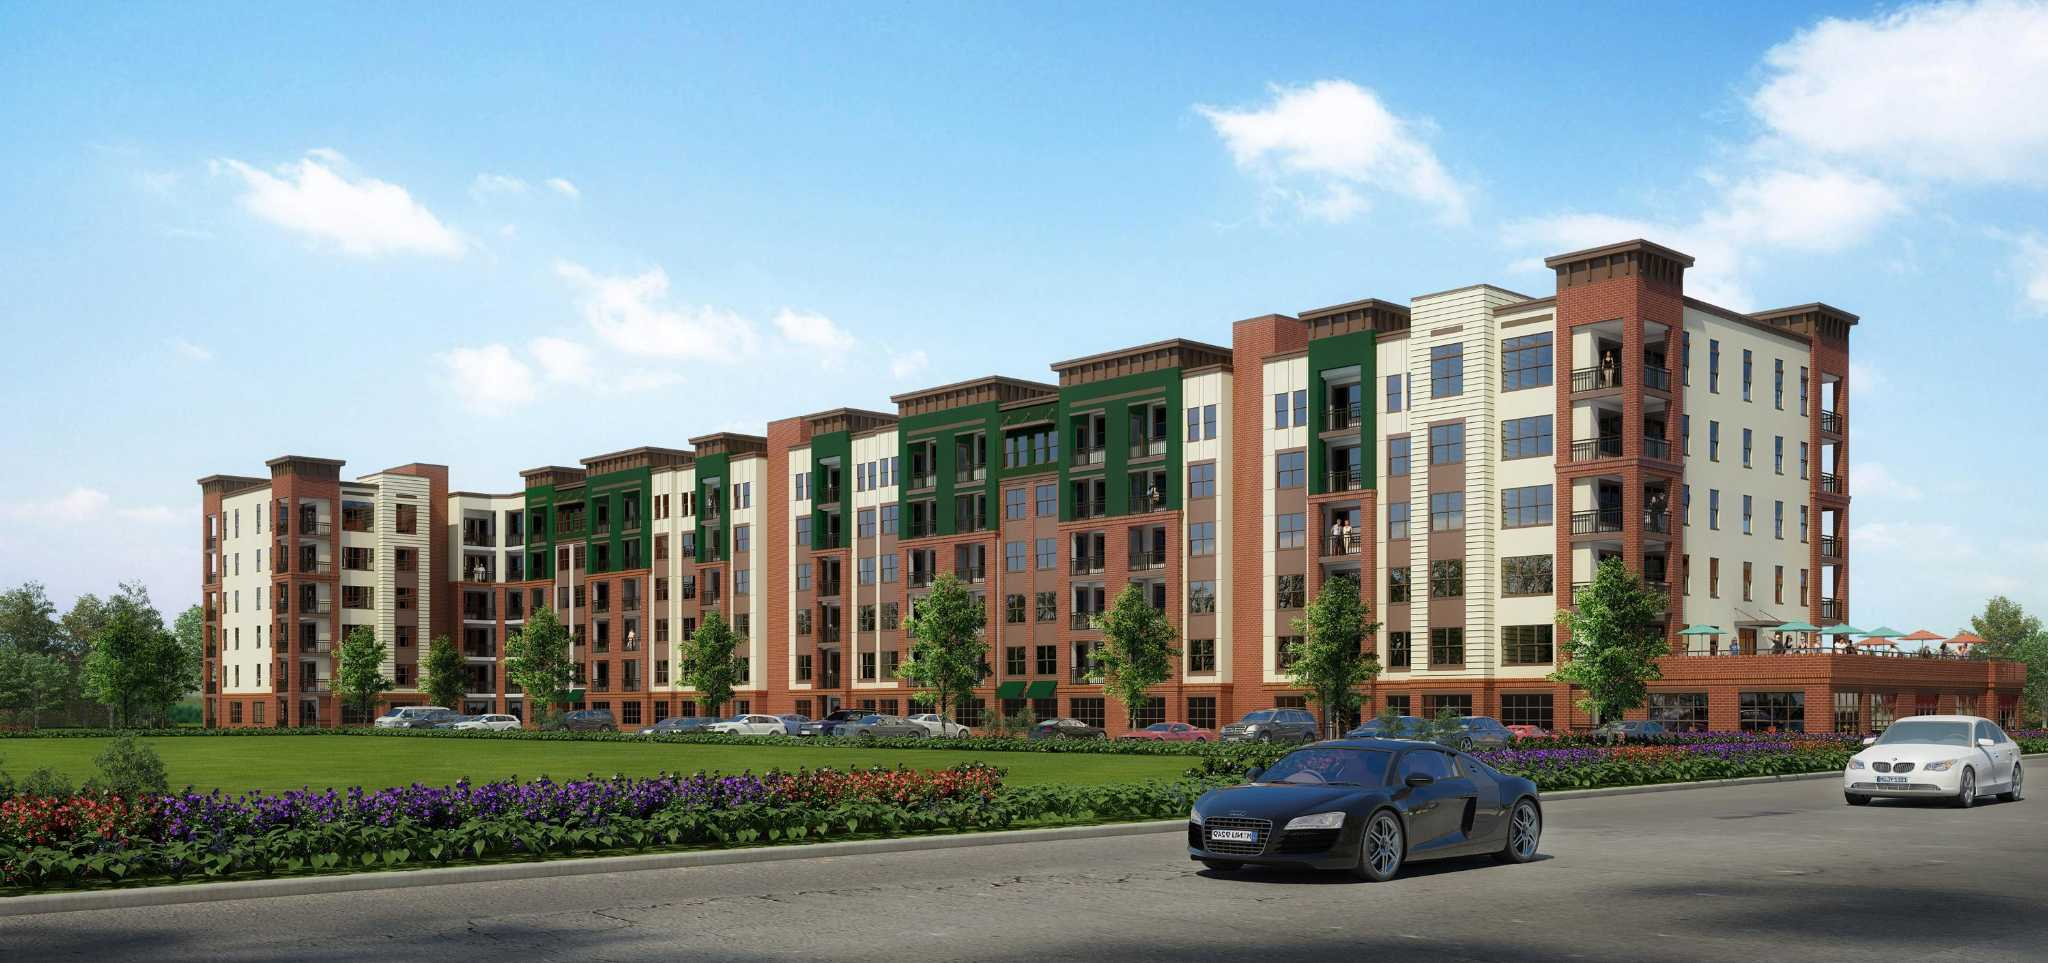 developer proposes 150 apartments in downtown danbury